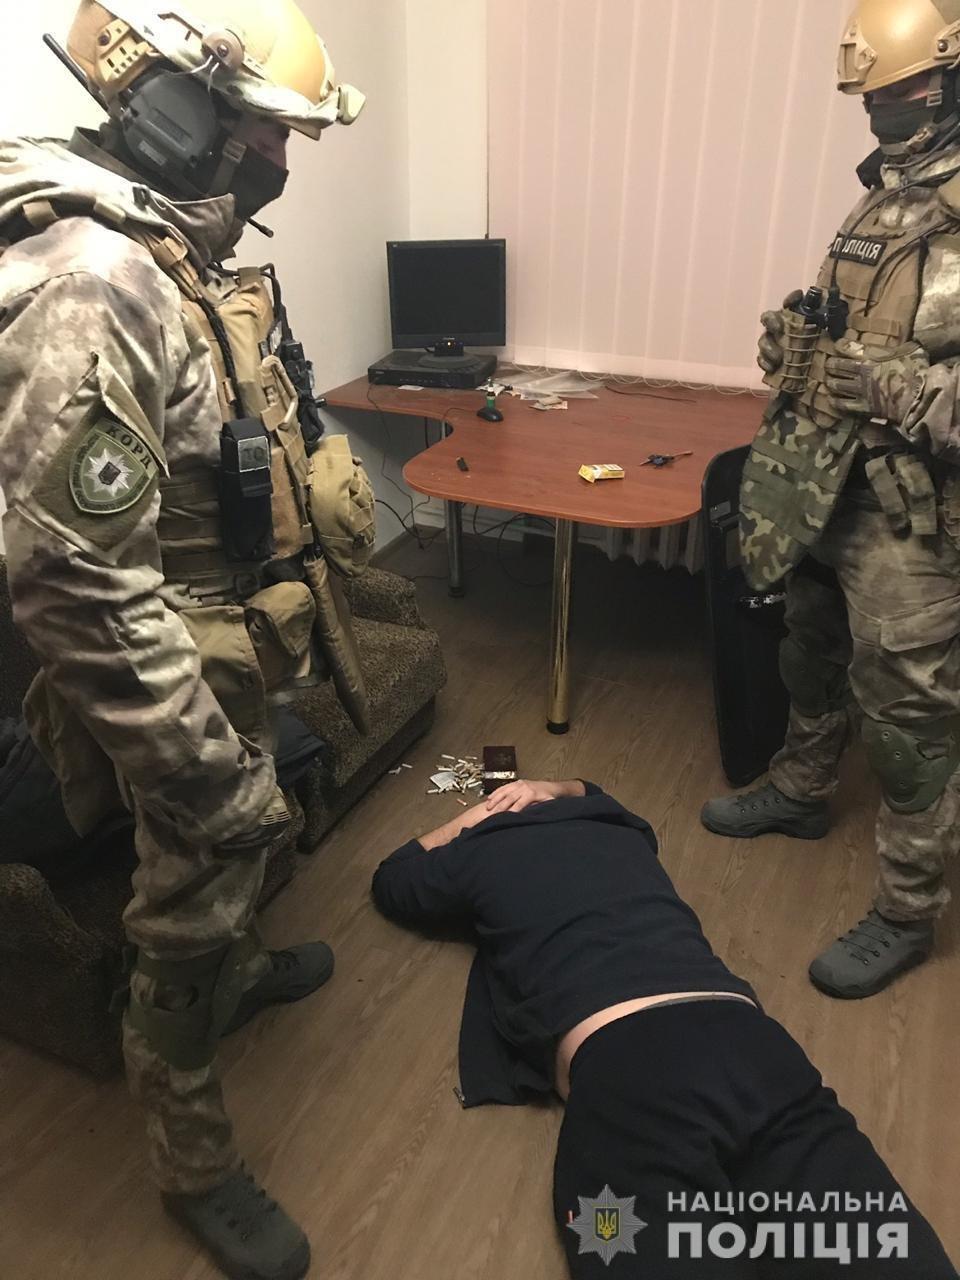 Житель Днепра организовал точку продажи наркотиков на съемной квартире, - ФОТО, ВИДЕО, фото-1